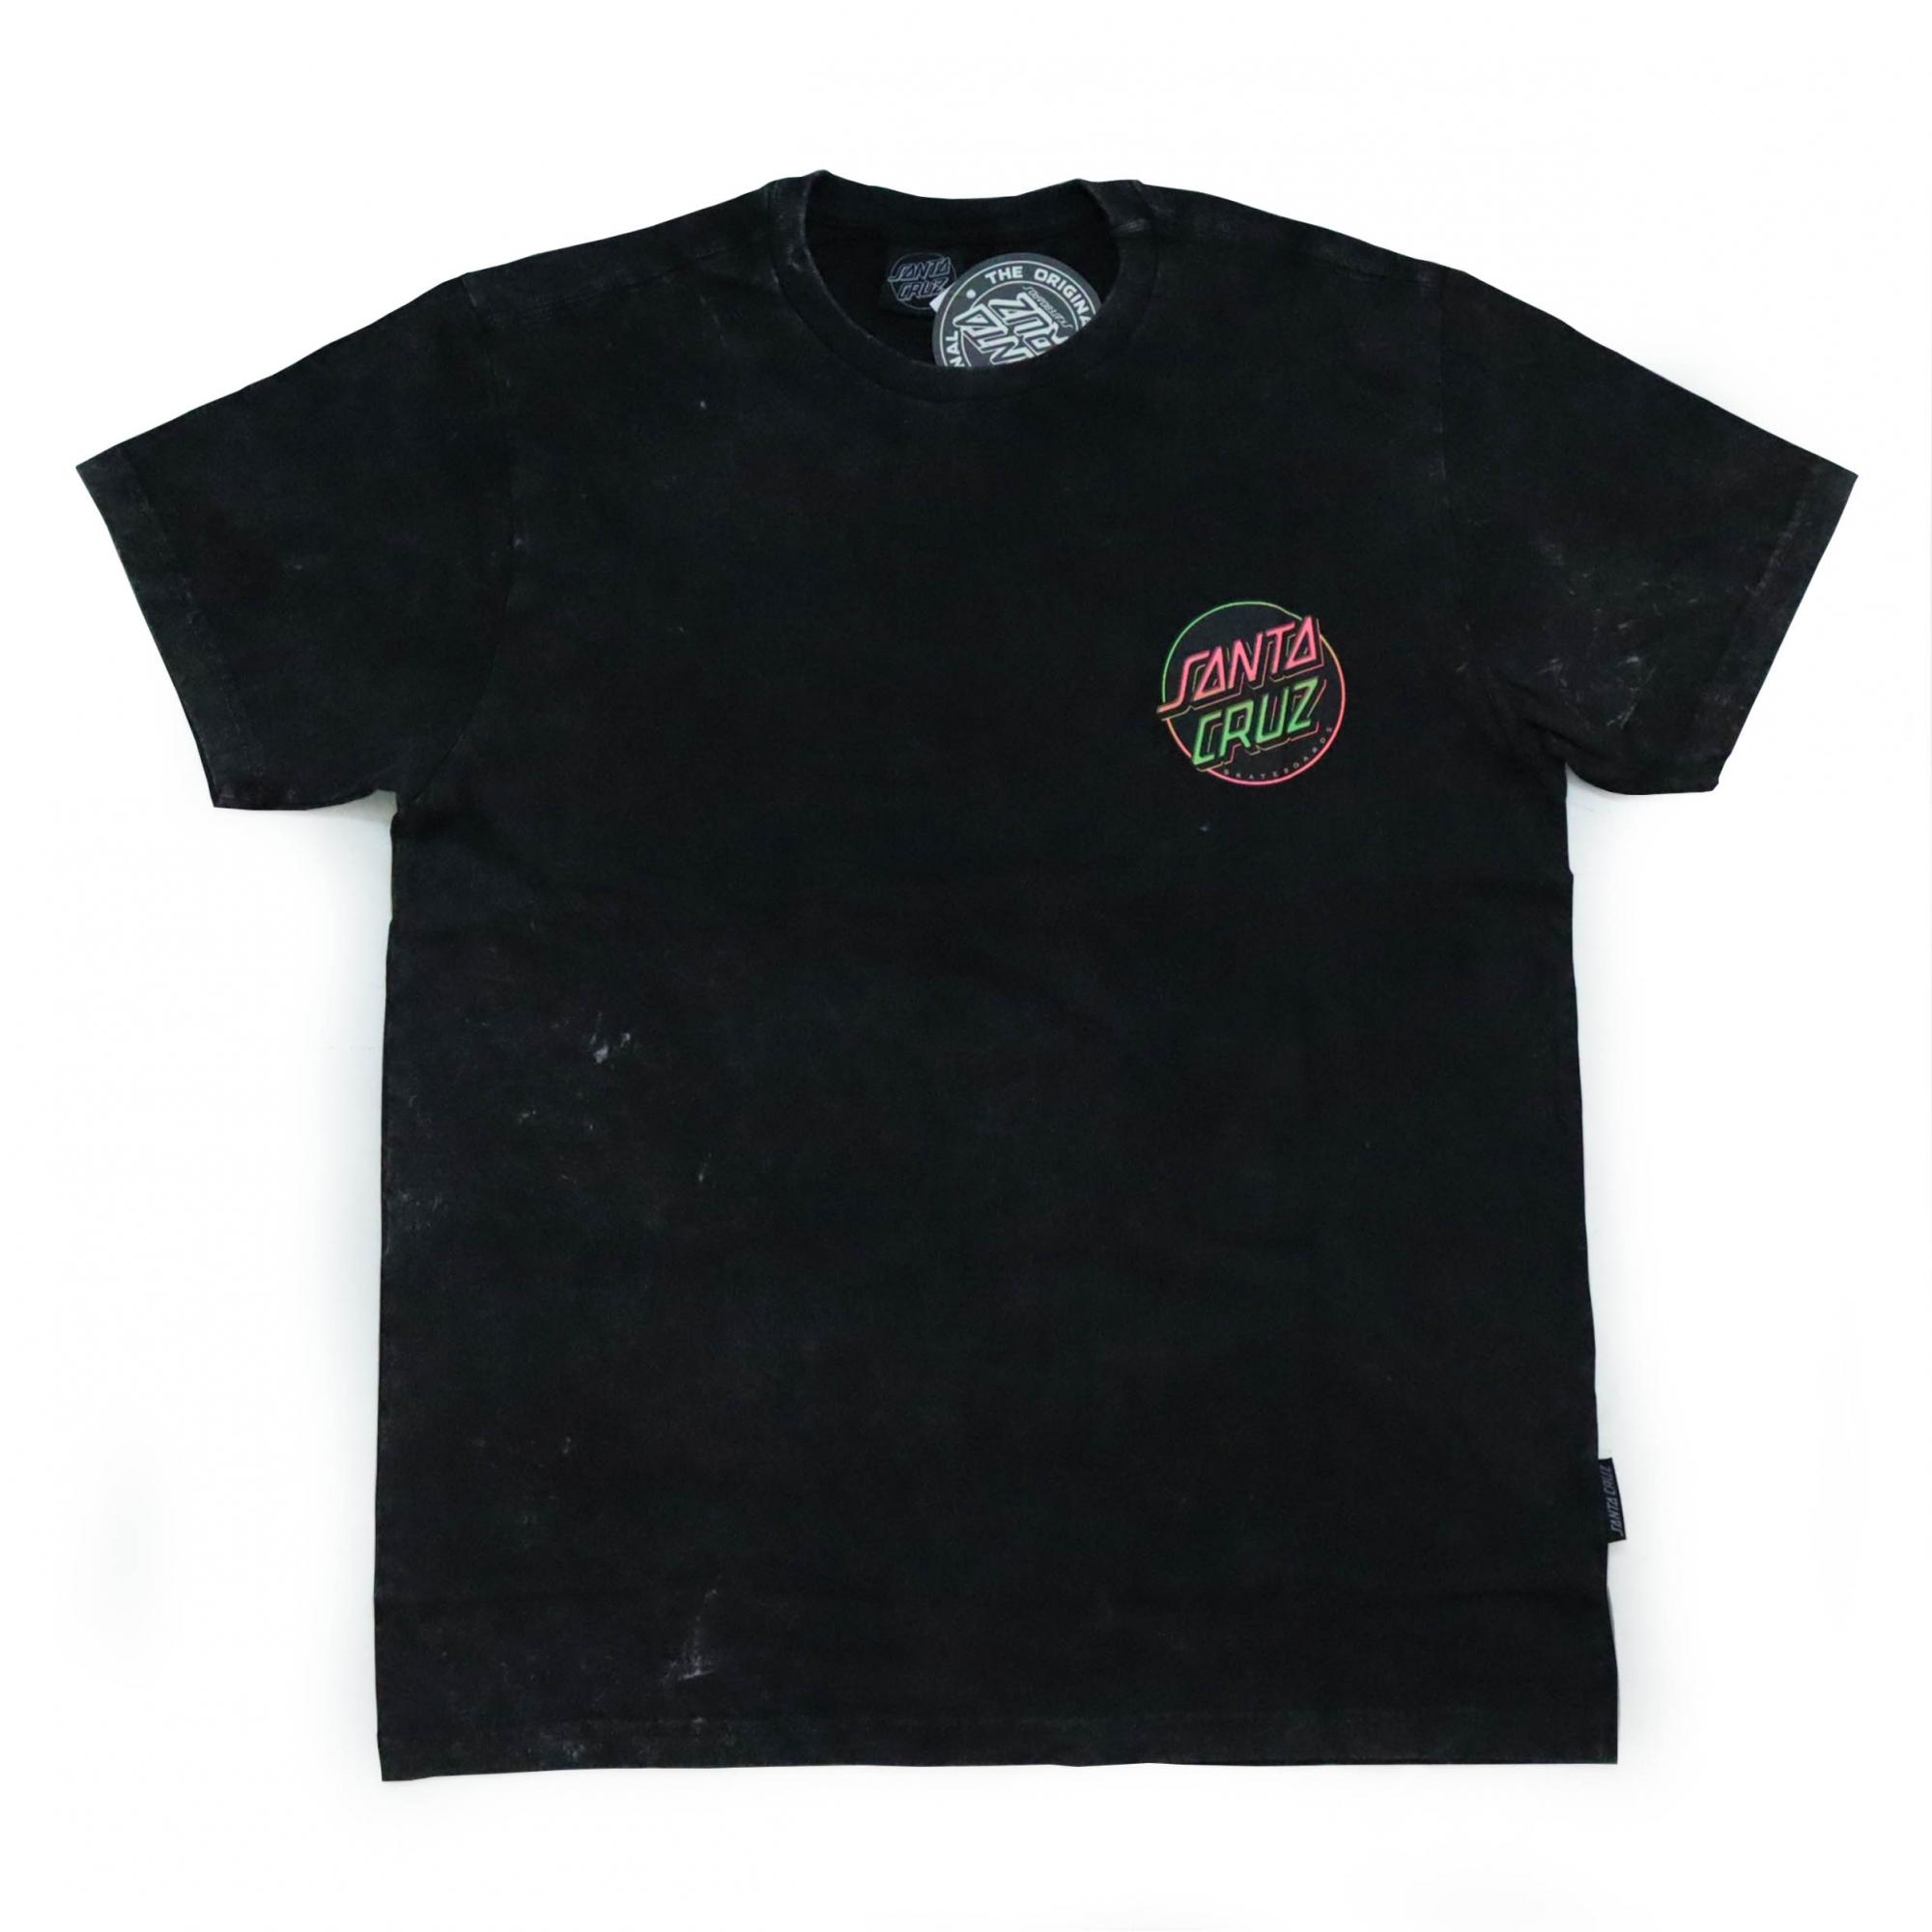 Camiseta Santa Cruz Especial Contra Dot - Preto Estonado